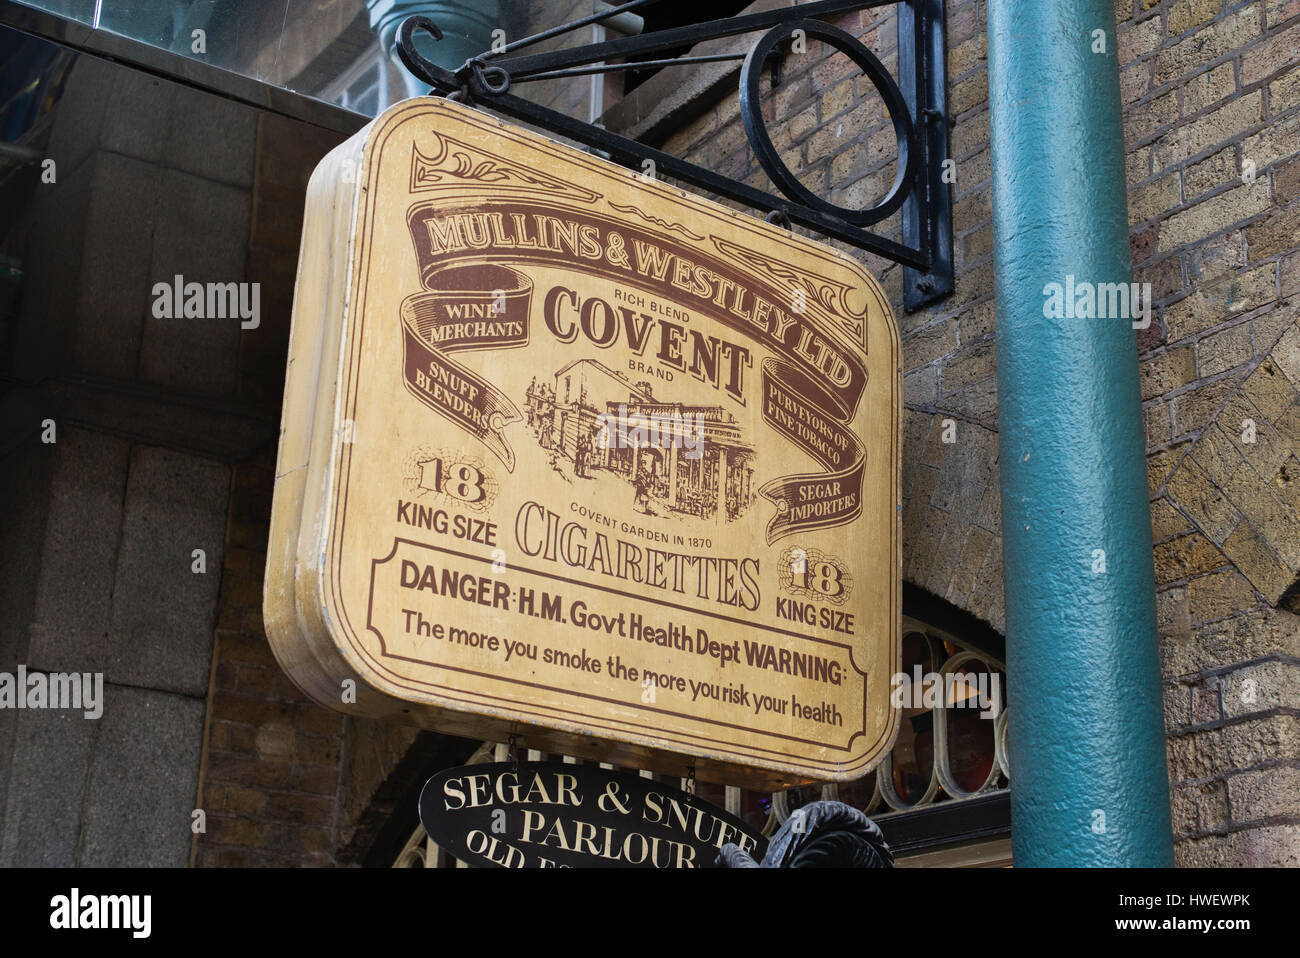 Order cheap Gauloises cigarettes online